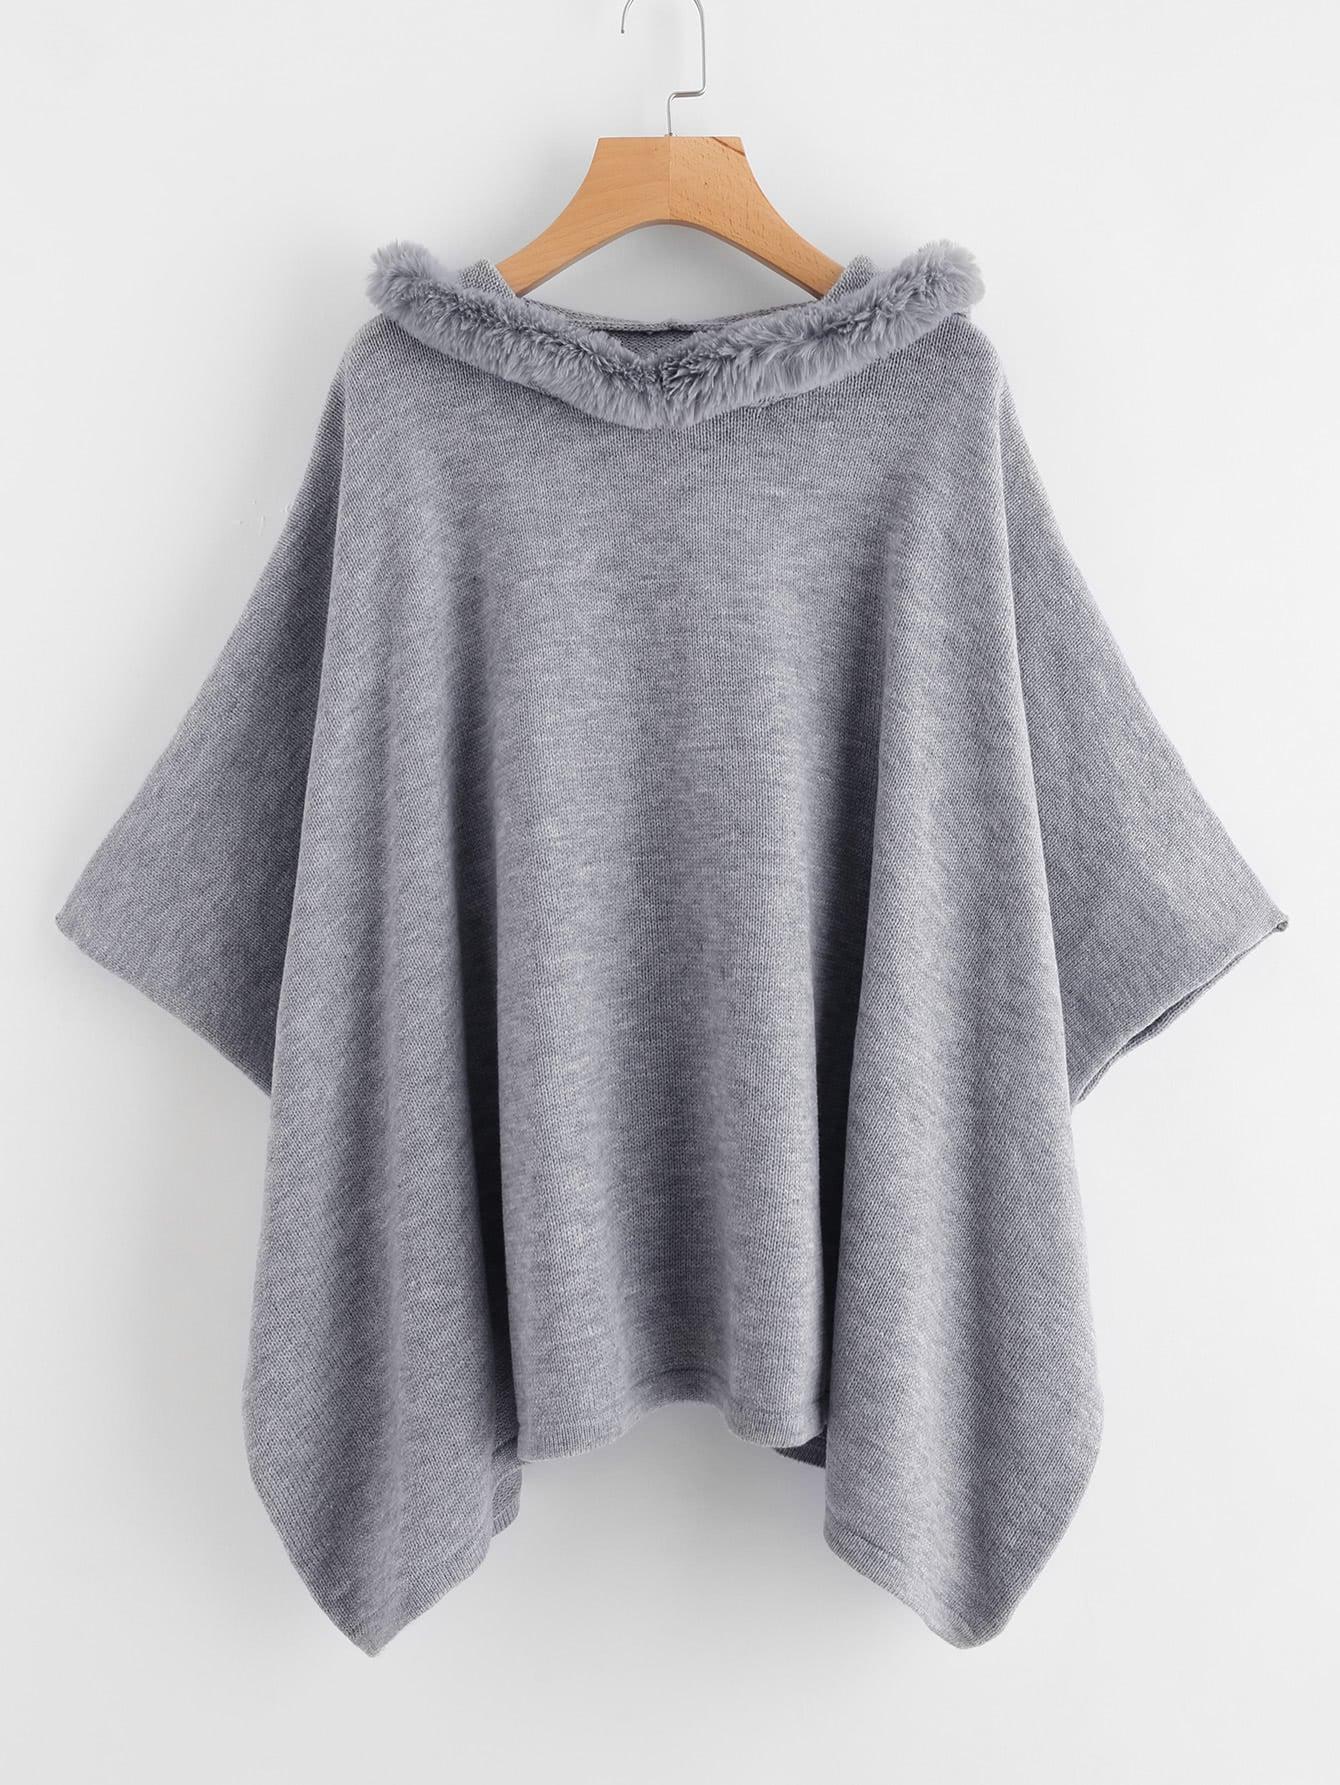 Hanky Hem Faux Fur Trim Hooded Poncho Sweater camo insert faux fur trim denim jacket